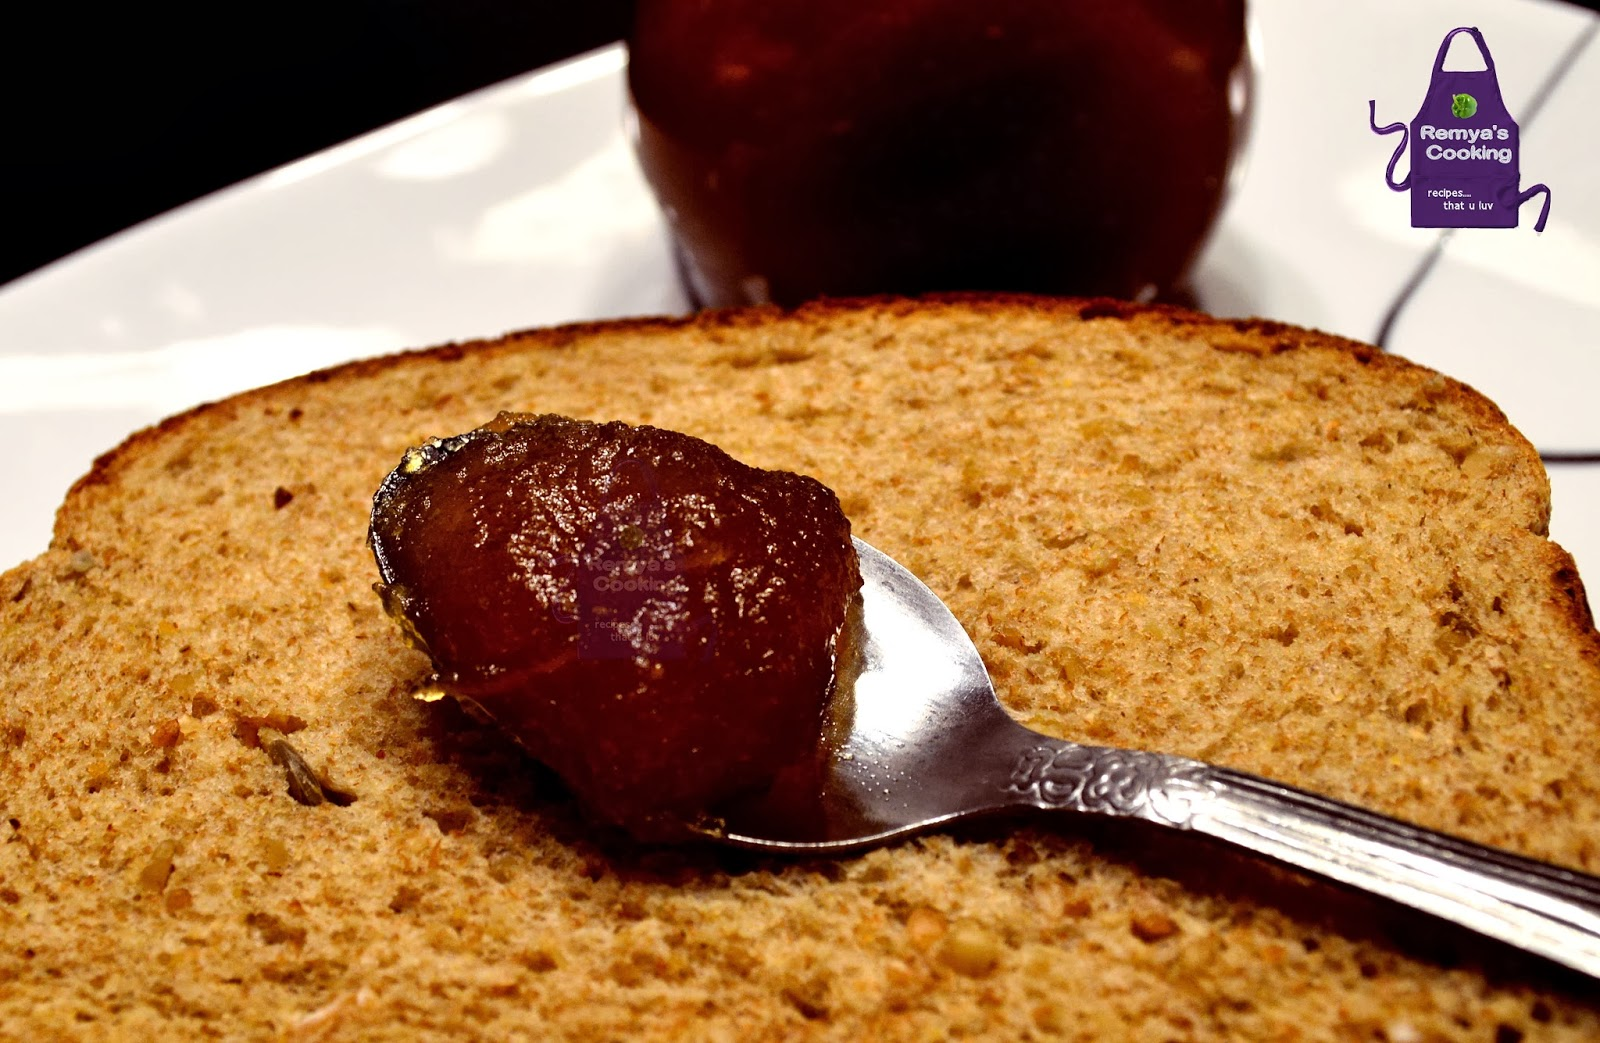 Remya's Baking Apple Jam